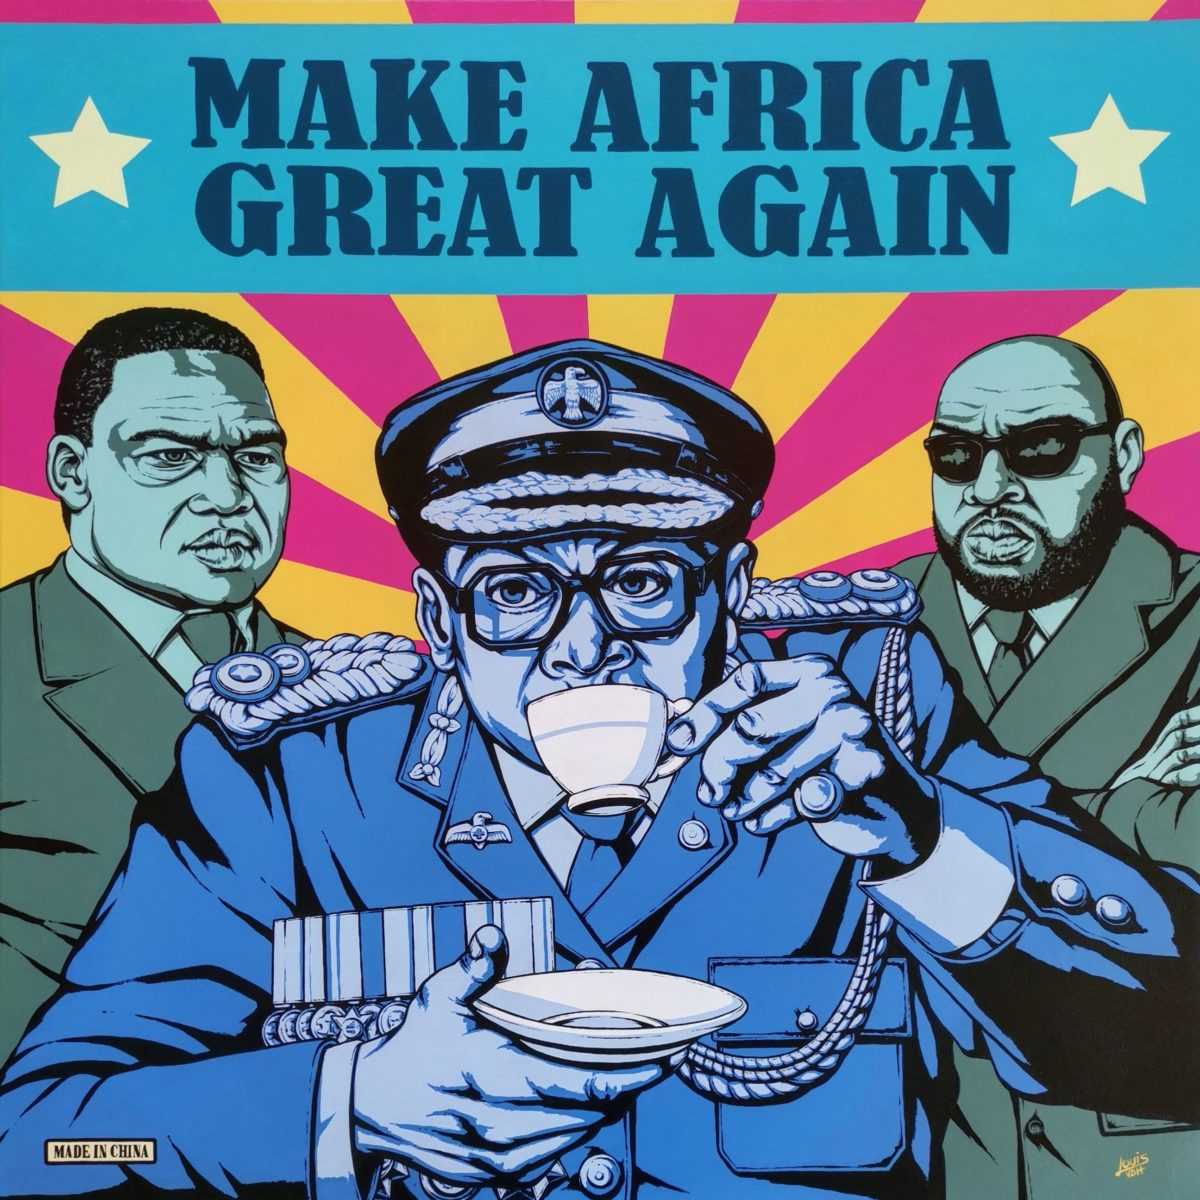 Louis Van Den Heever - Make Africa Great Again - 2017